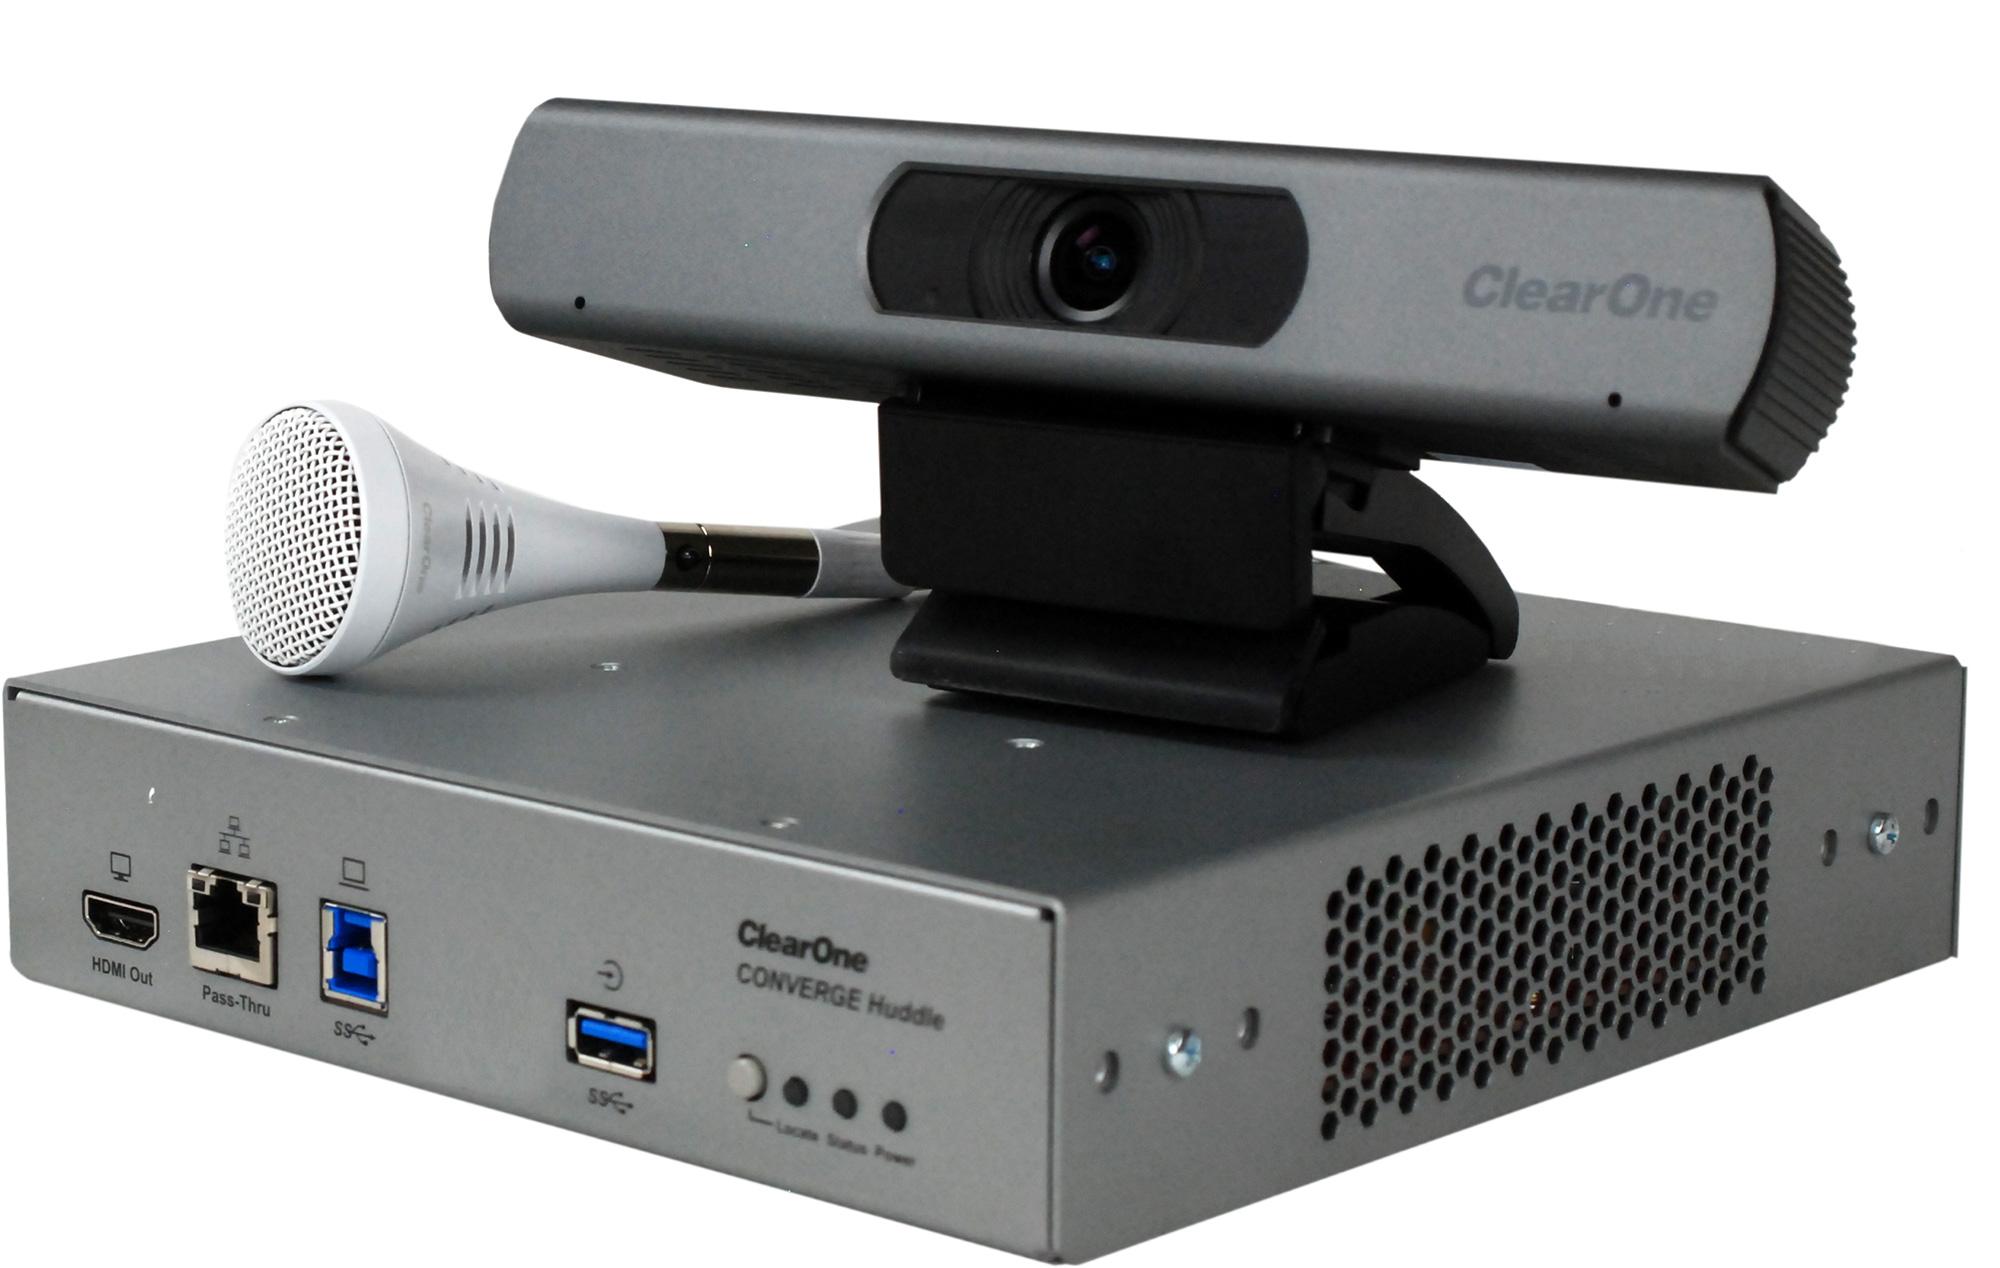 ClearOne COLLABORATE Versa 150 CONVERGE Huddle CTH/UNITE 150 USB PTZ HD Camera/Ceiling Mic Array - White CL1-930-3200-150